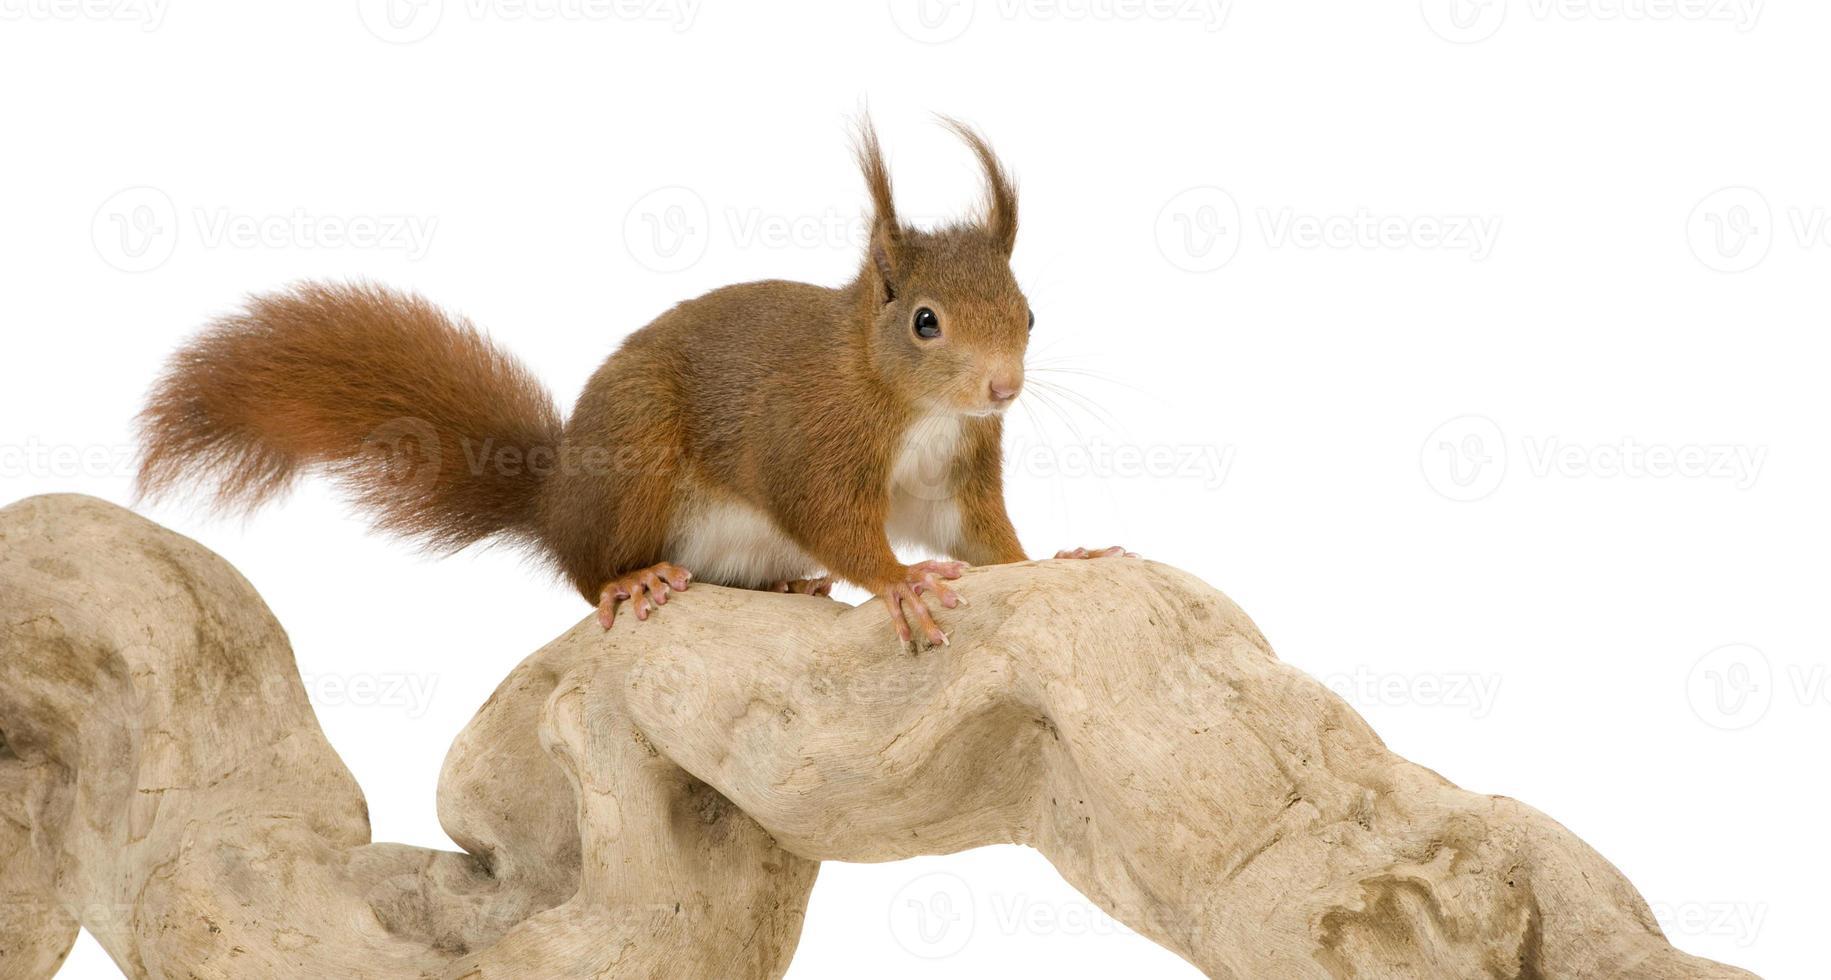 Eurasian red squirrel - Sciurus vulgaris (2 years) photo